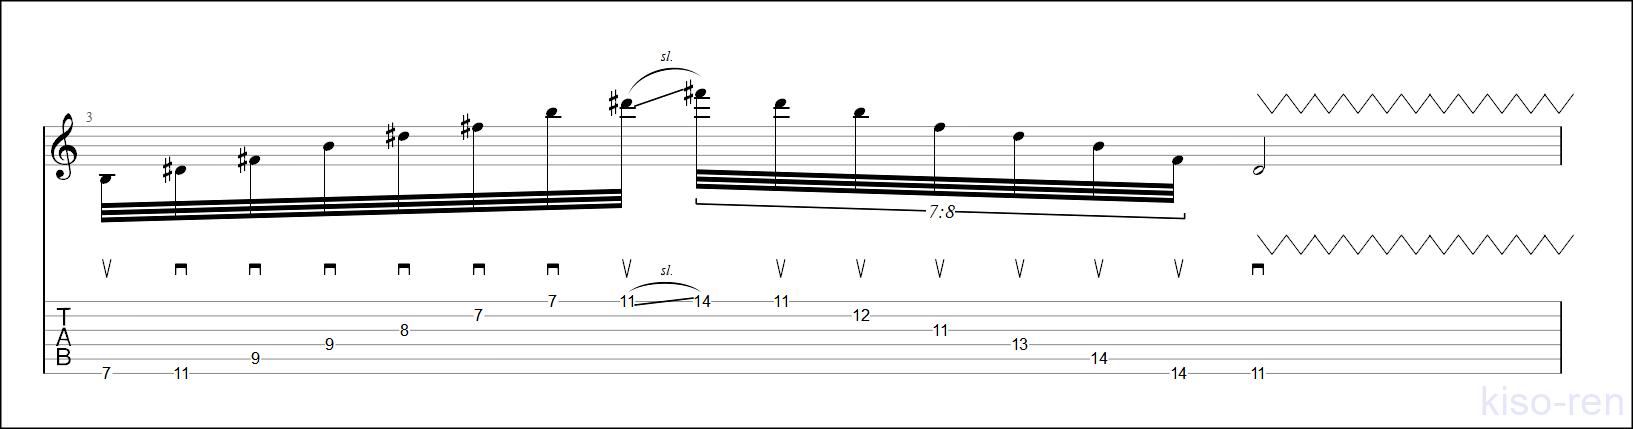 Bm Sweep Picking【TAB】Big Sweep Picking John Petrucci  6弦スウィープピッキング ジョン・ペトルーシ 練習【Practice TAB】